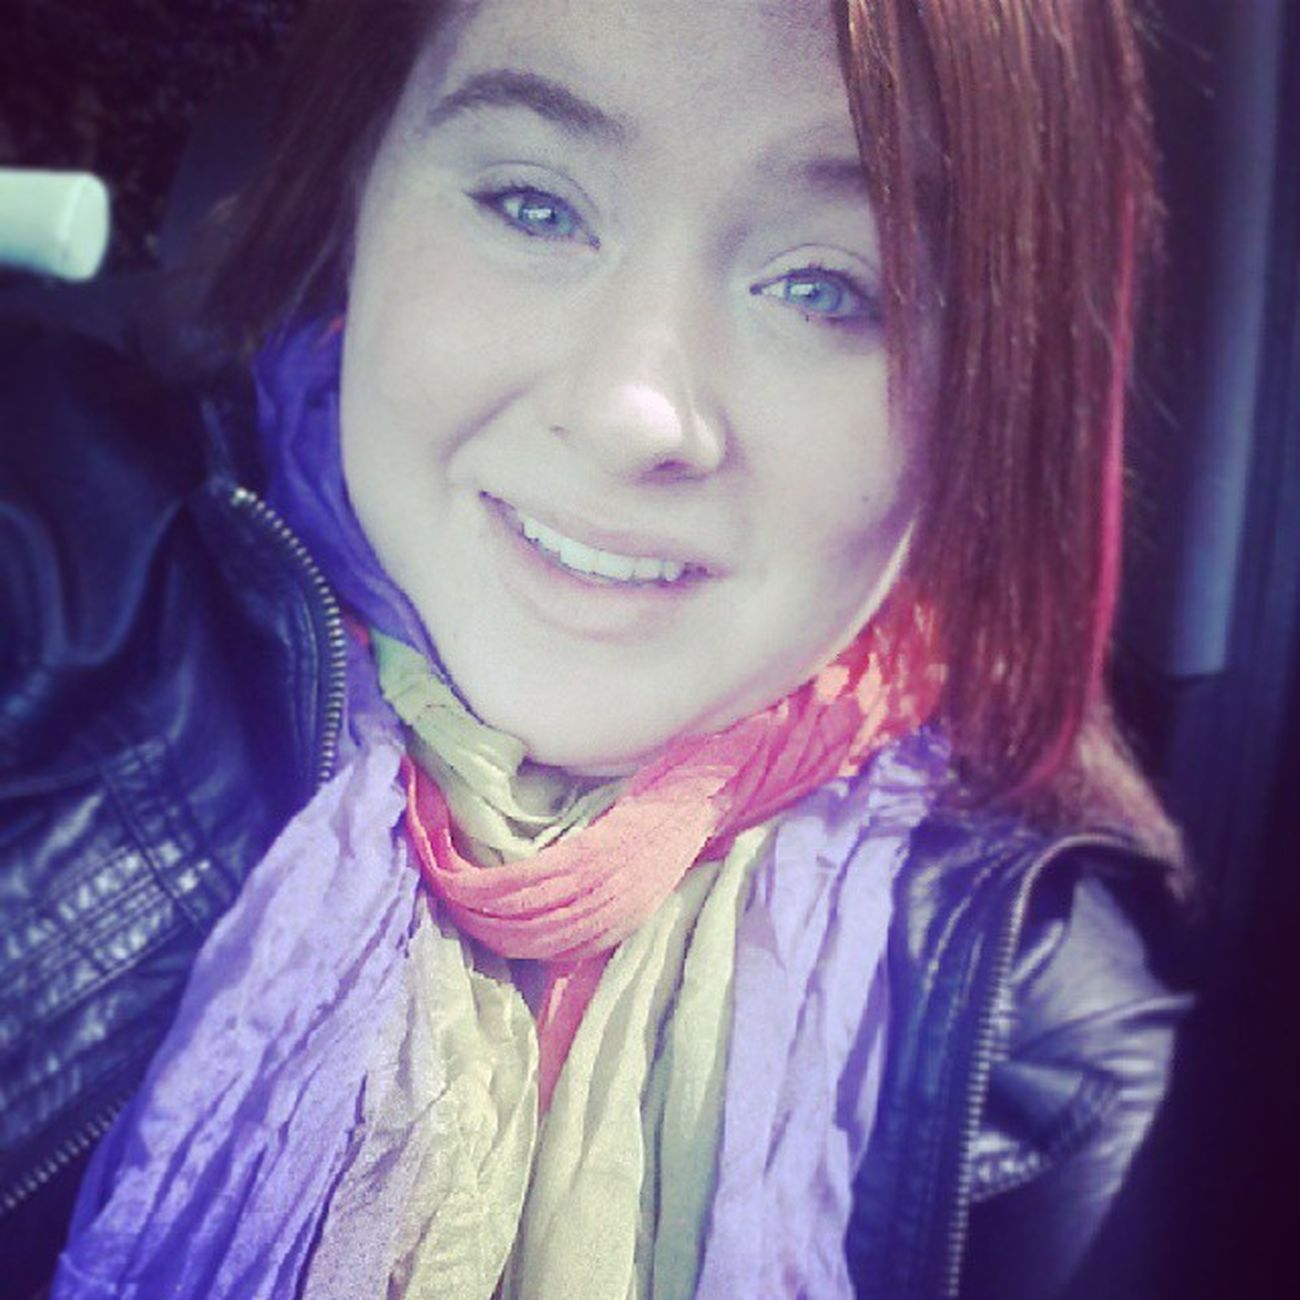 Nomakeup Newscarf Redhairdontcare Breadtcancerawarness pinkhair blueeyes smile